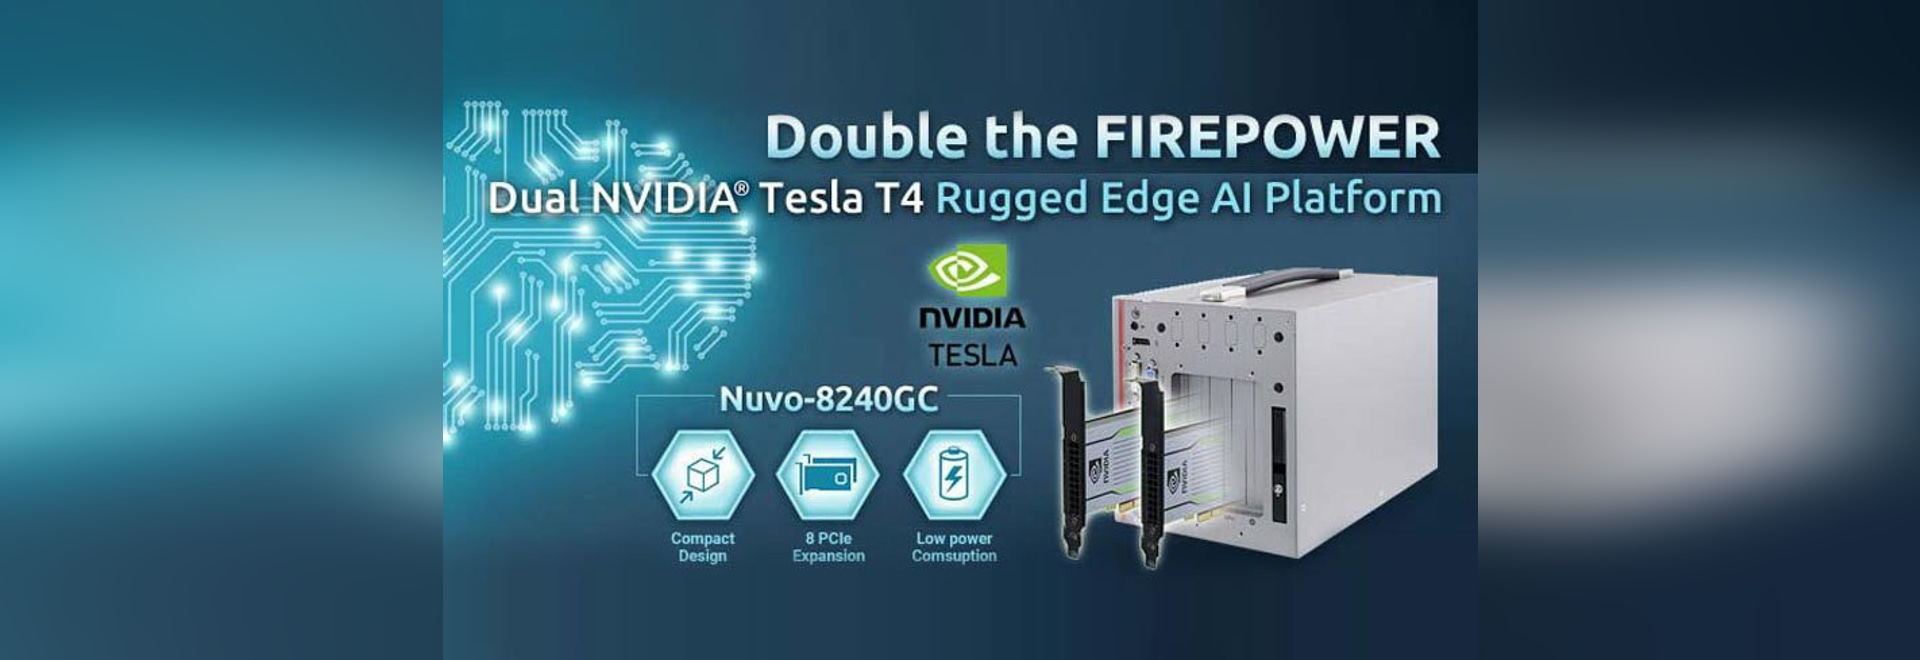 Neousys Nuvo-8240GC Dual Tesla T4 Rugged GPU computing Edge AI Platform Leads the Industry with Double Firepower